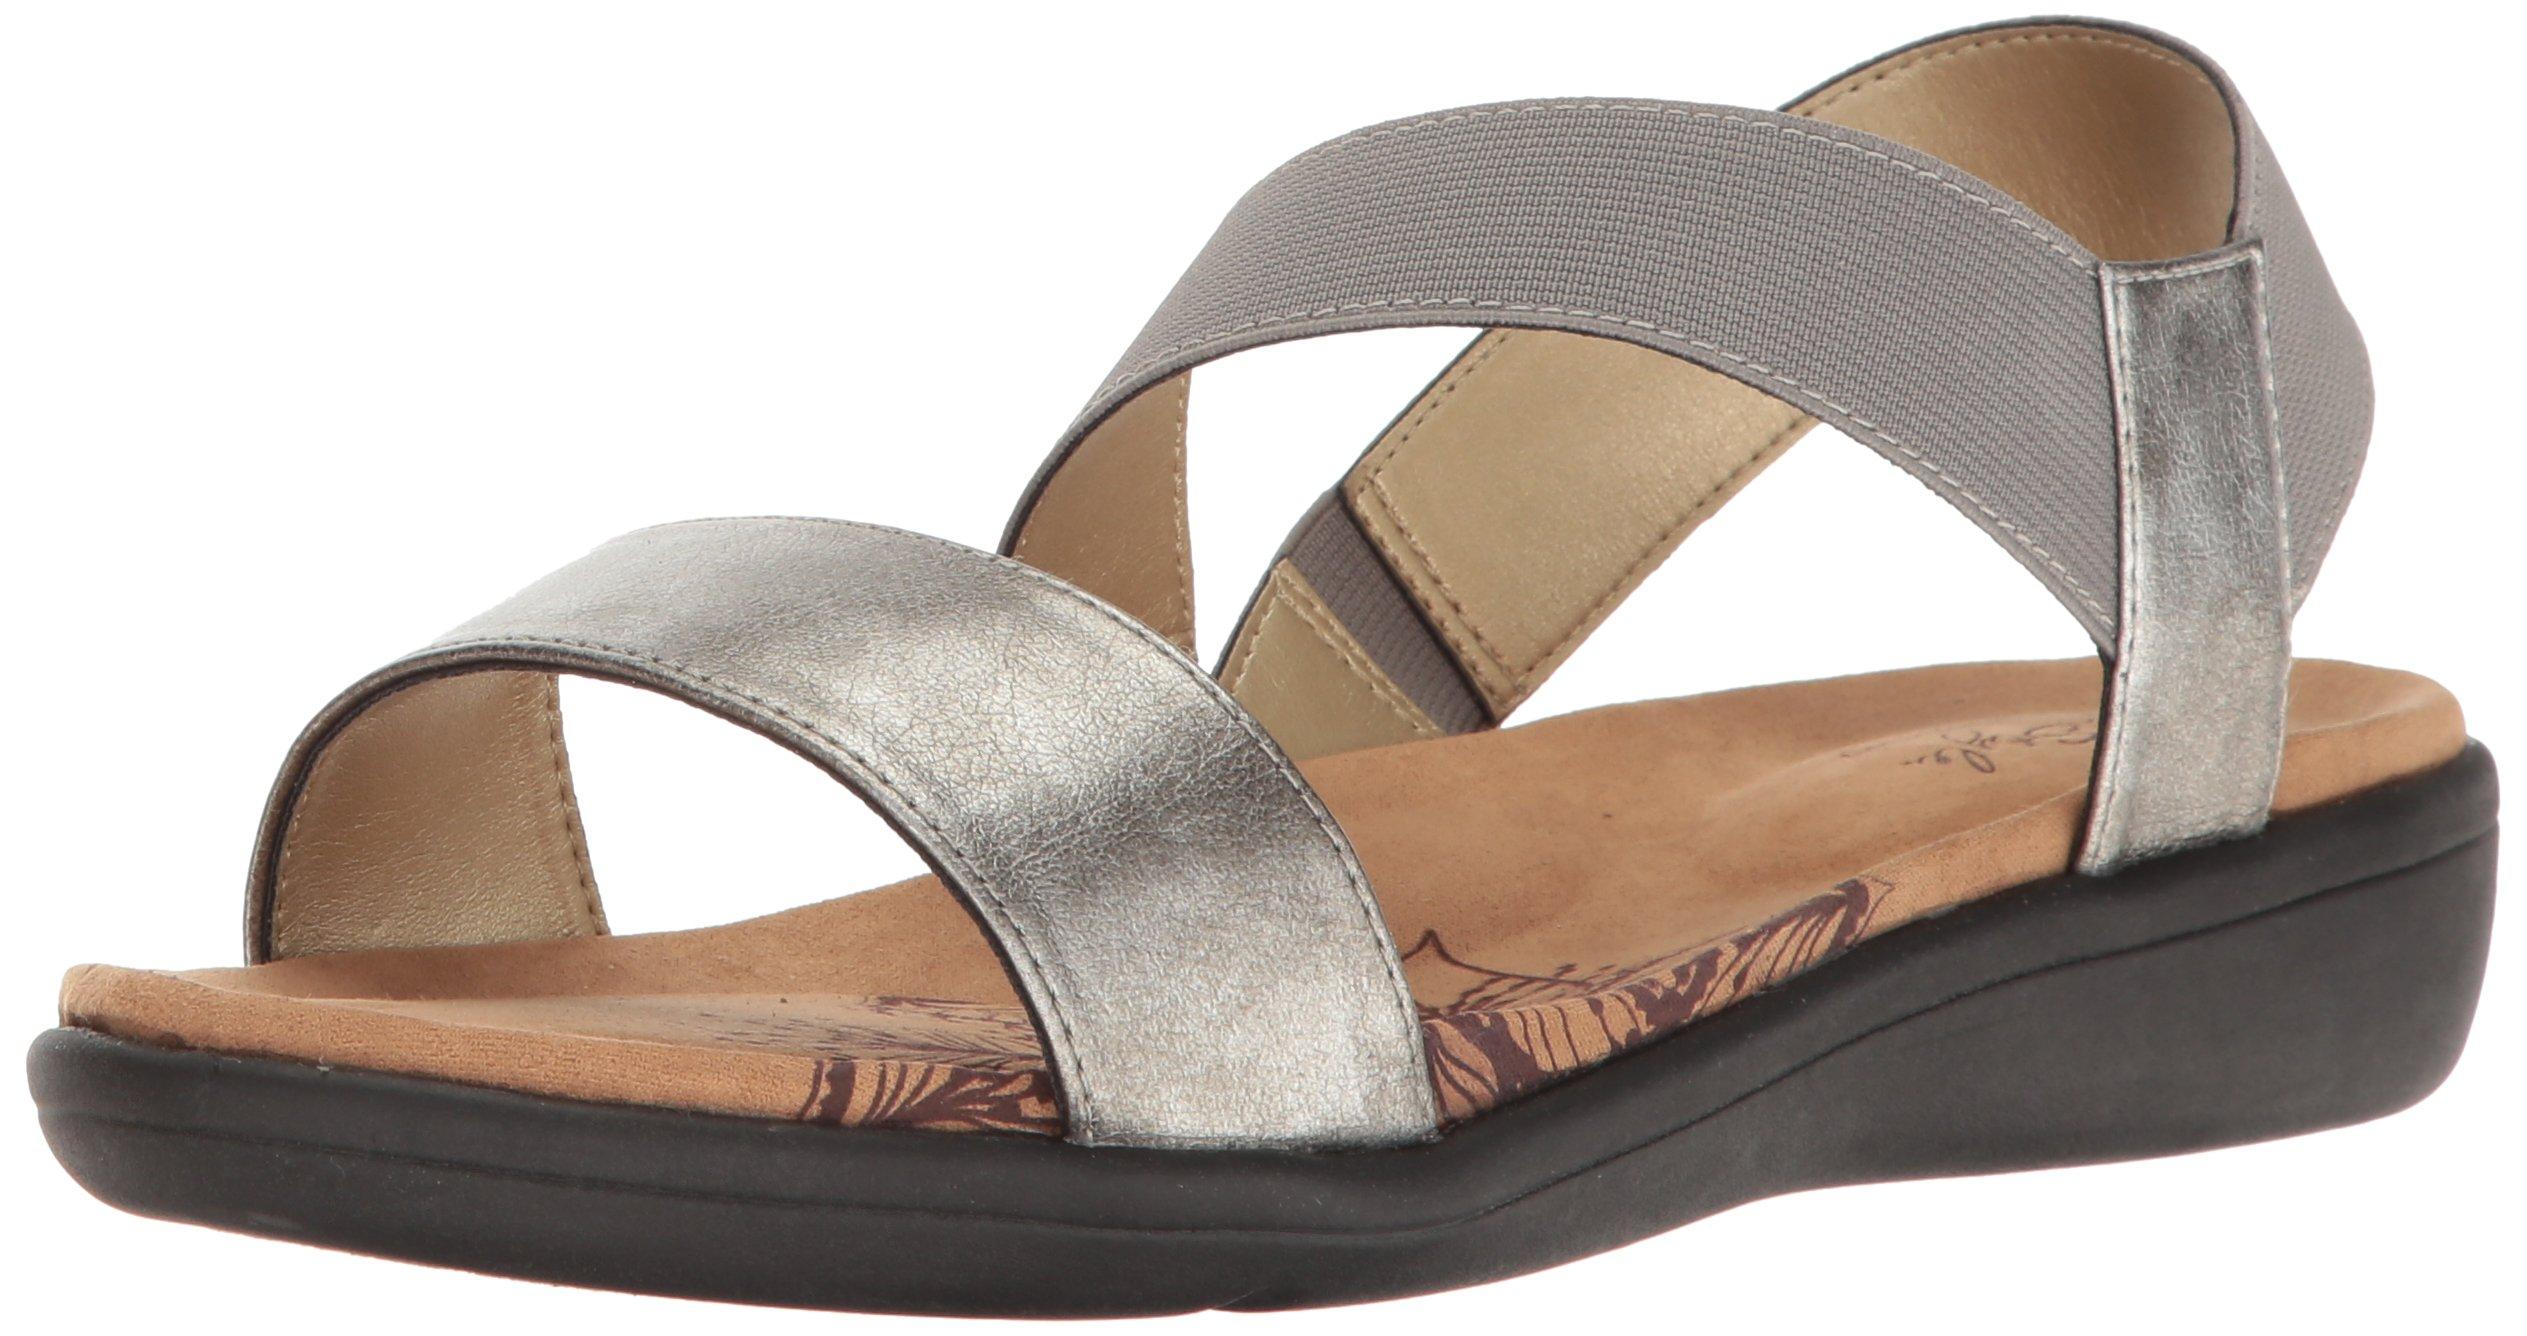 Soft Style Hush Puppies Women's Prema Flat Sandal, Pewter, 8 M US